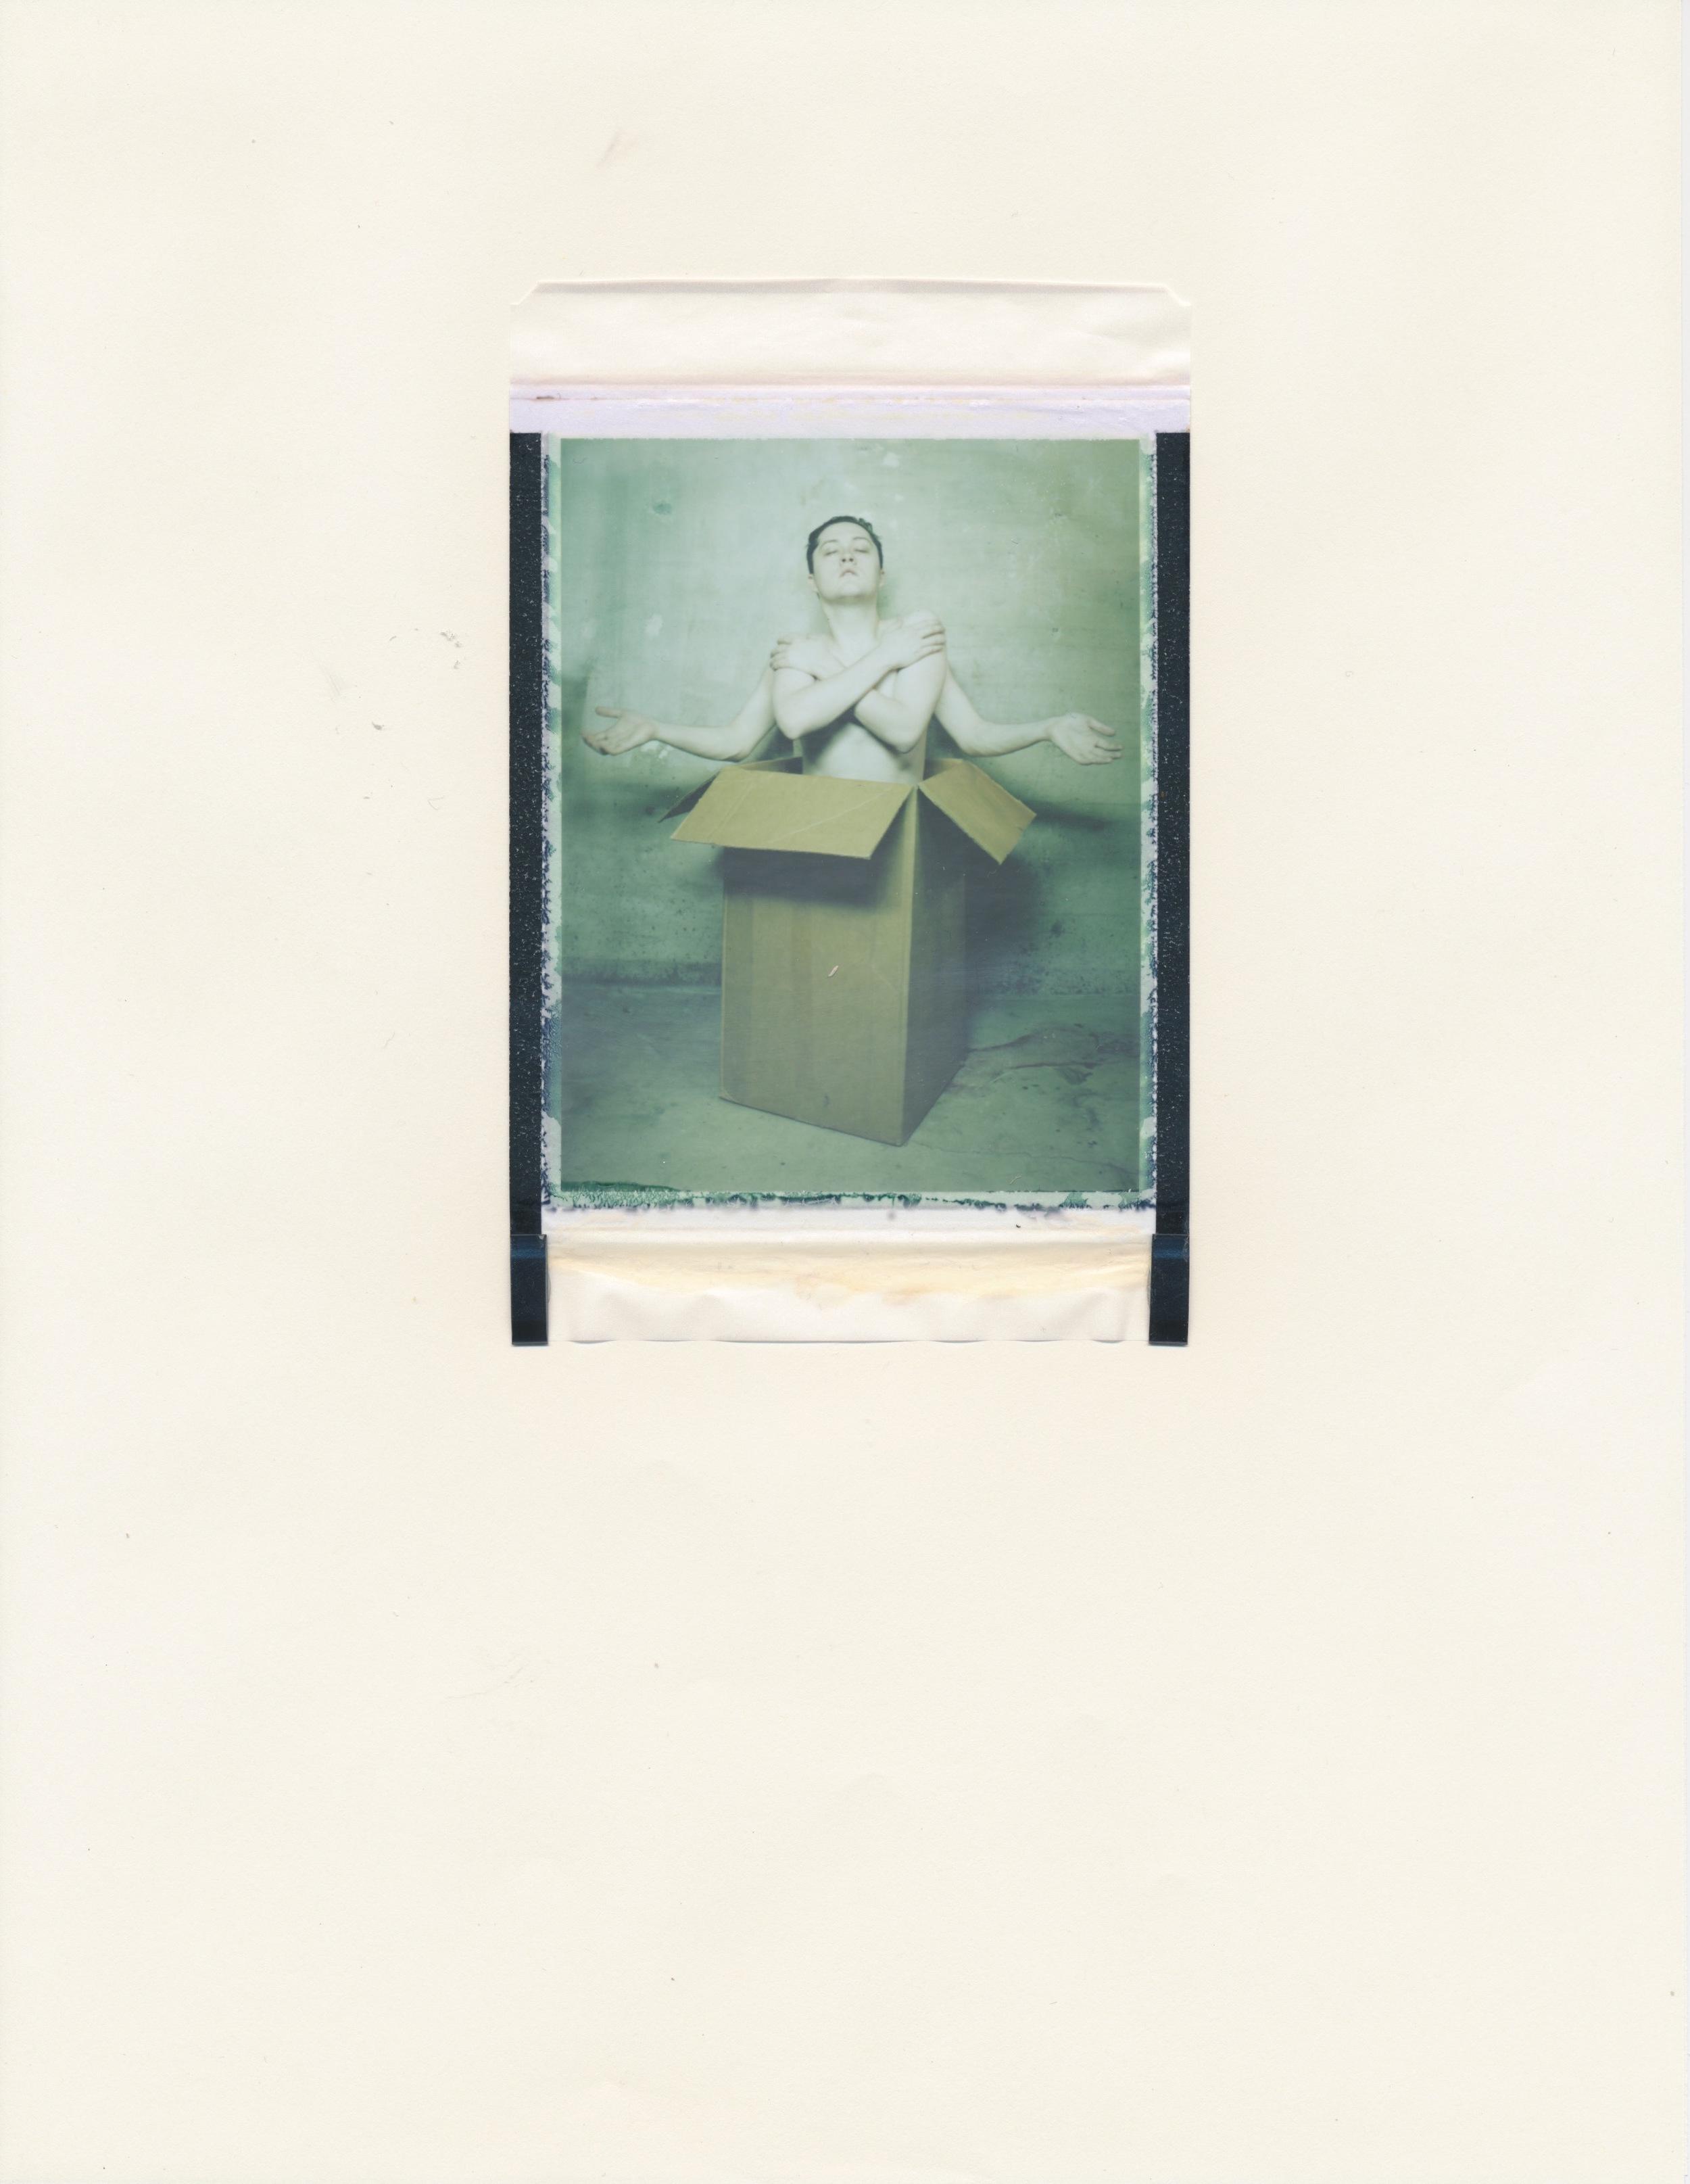 Human Obscura #8 (Figure in Box 1)   2015  Diffusion Transfer Print on Paper  8.5x11